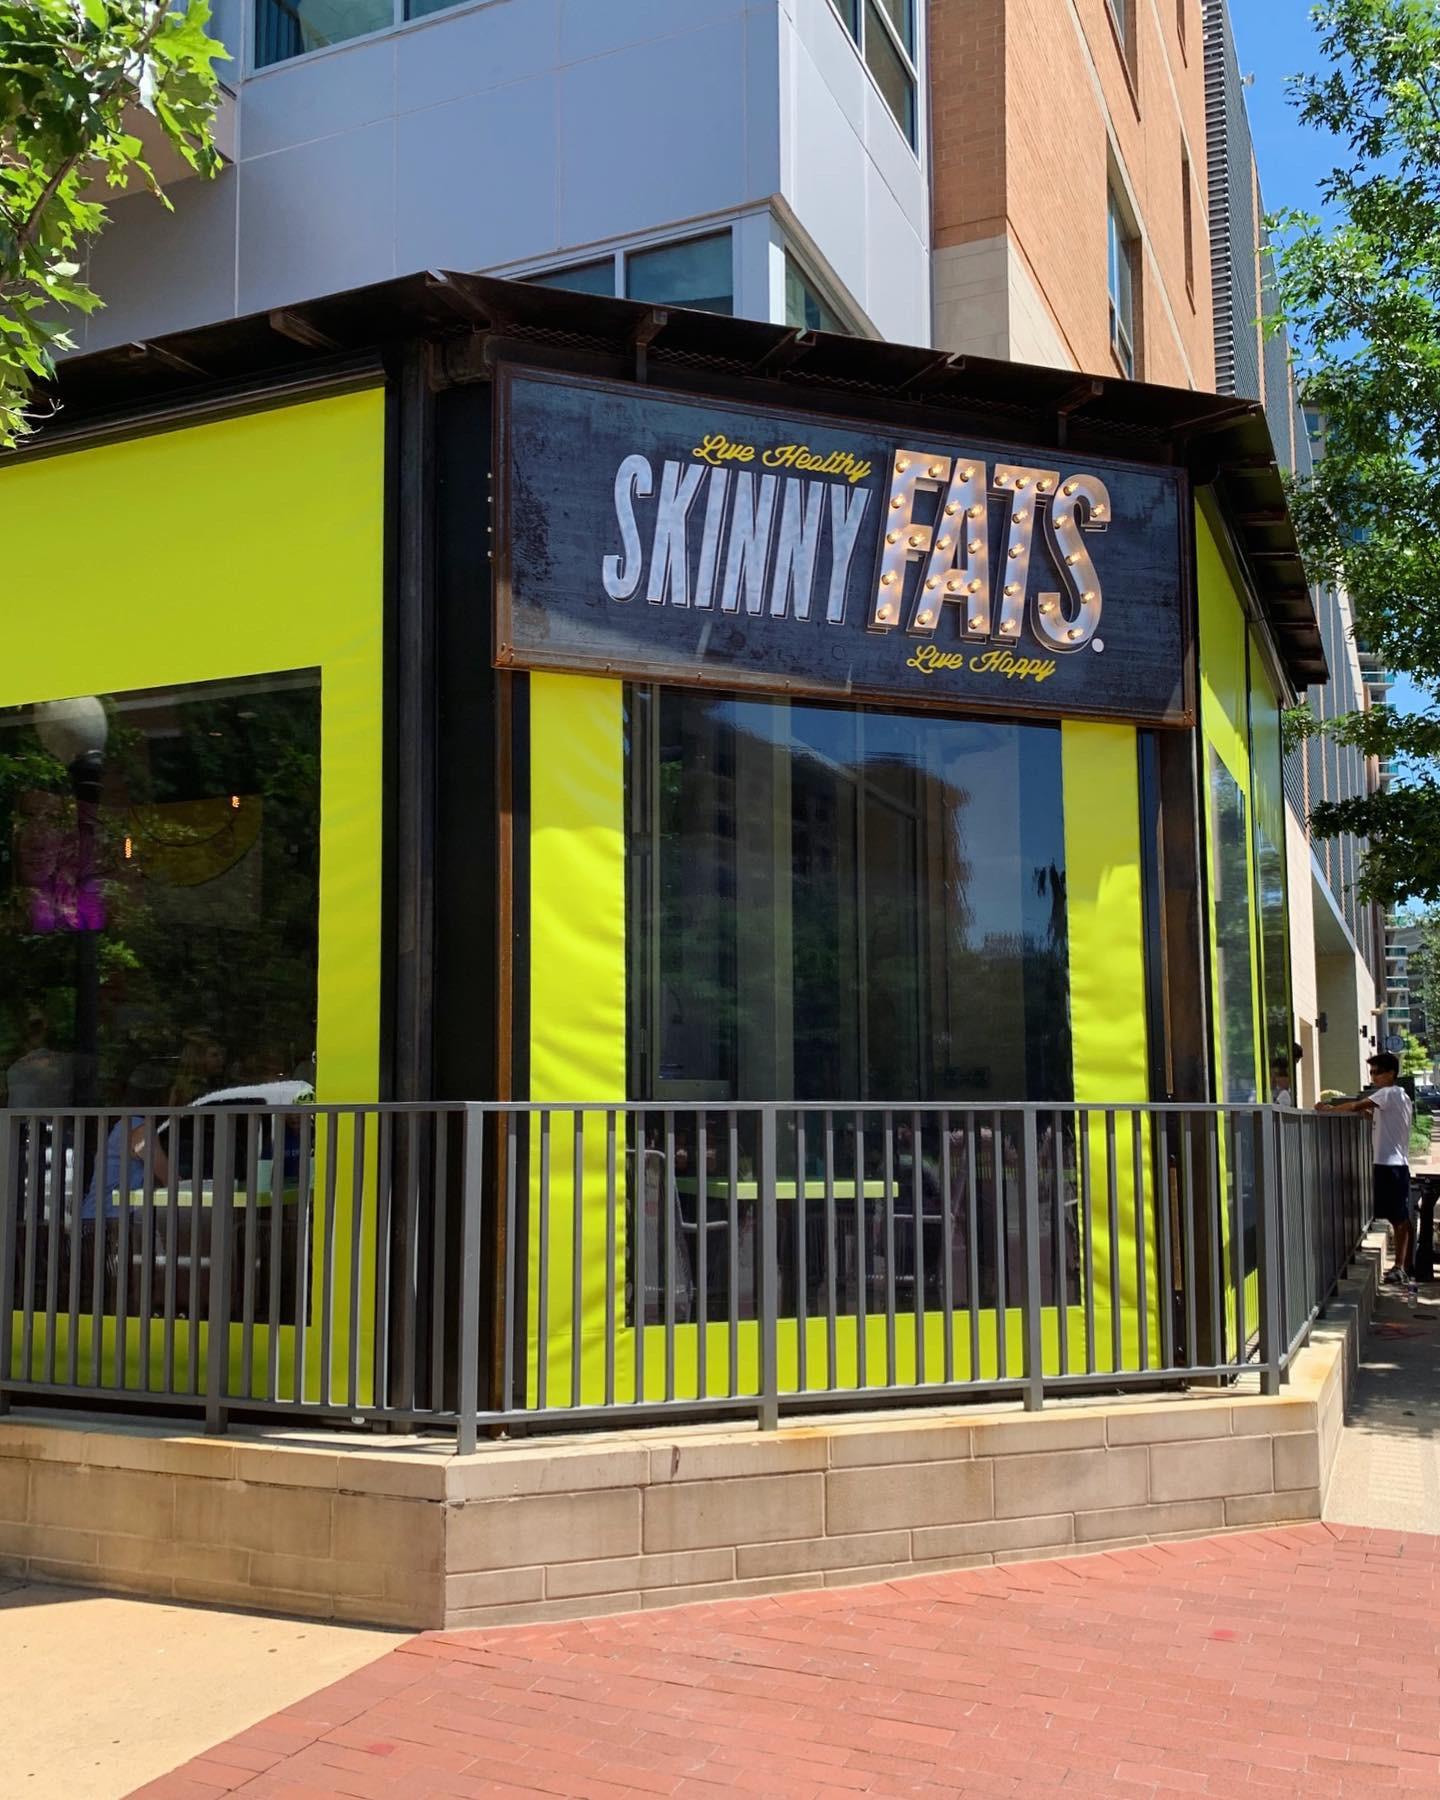 SkinnyFATS